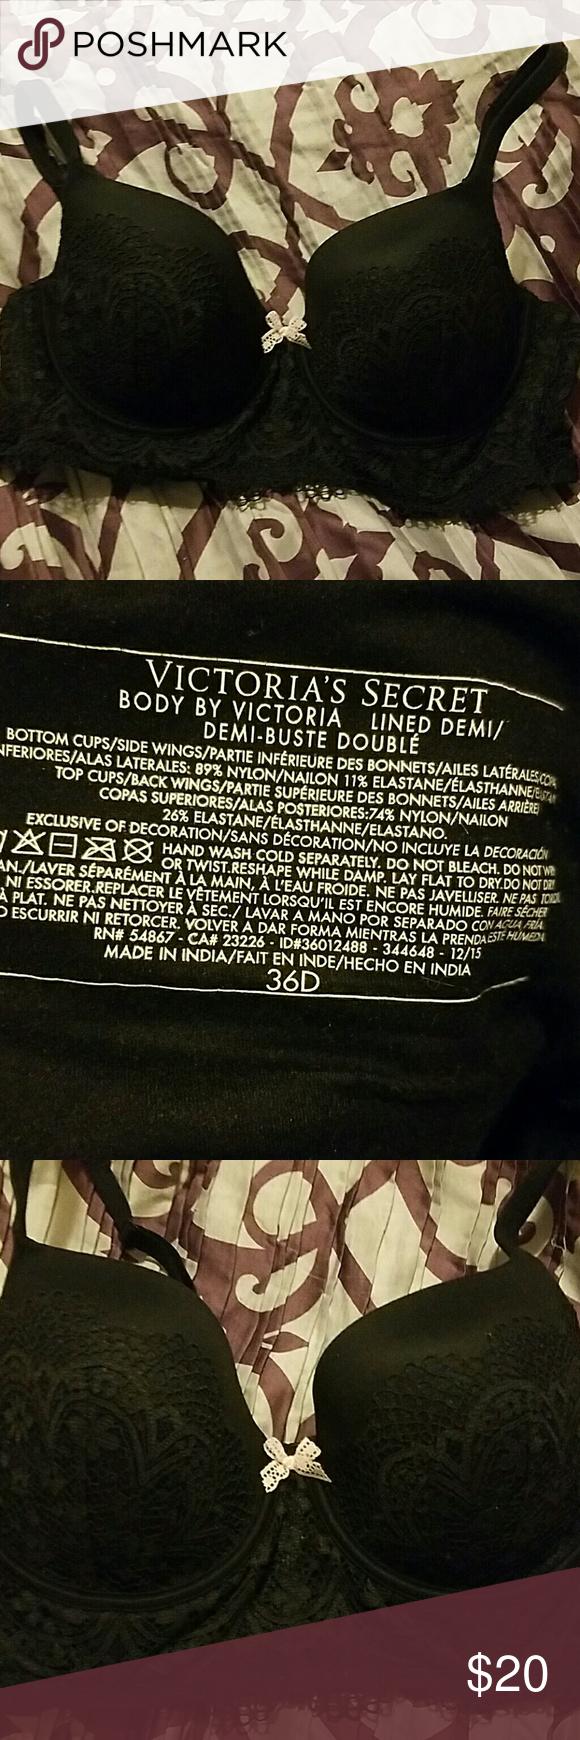 NWOT Victoria's Secret demi black bra NWOT Victoria's Secret demi black bra never worn Victoria's Secret Intimates & Sleepwear Bras